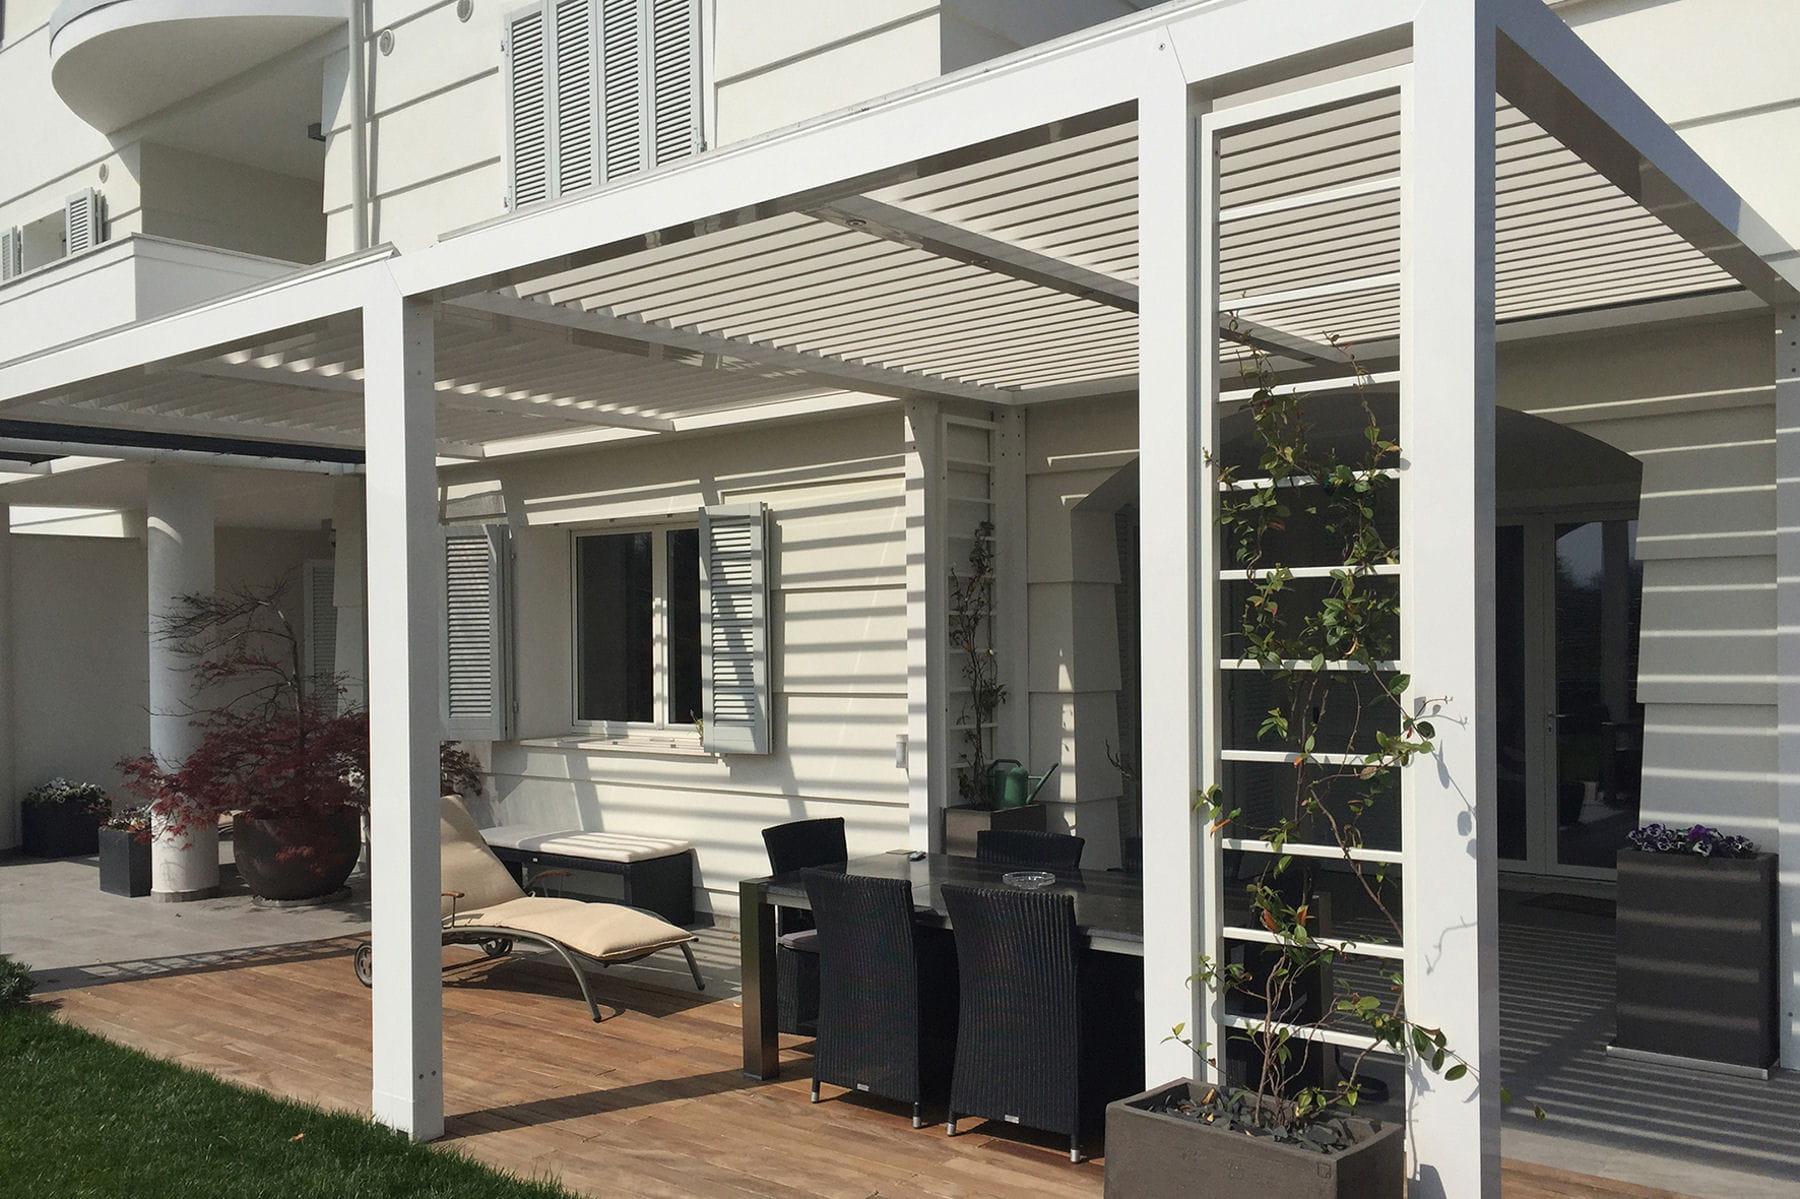 une pergola intelligente pour le jardin. Black Bedroom Furniture Sets. Home Design Ideas